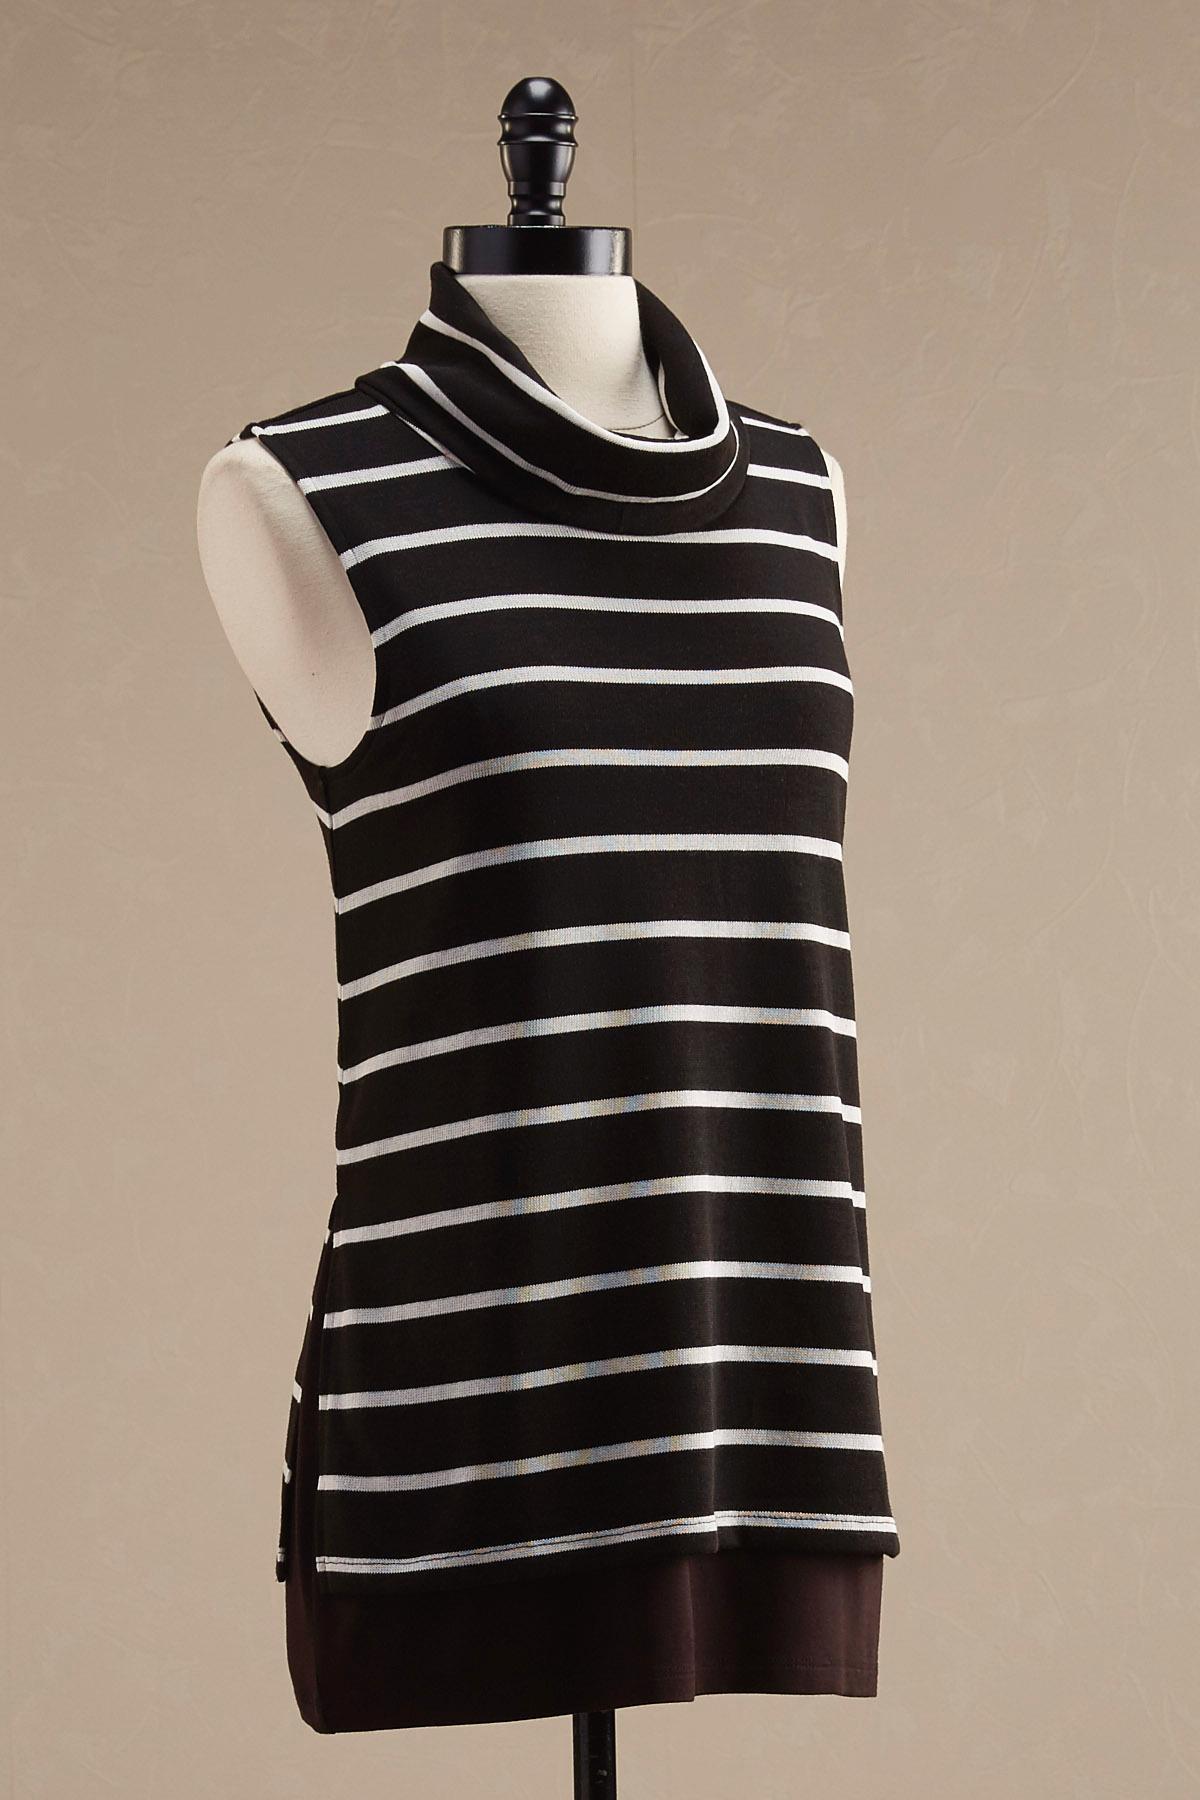 Striped Cowl Neck Layered Tunic